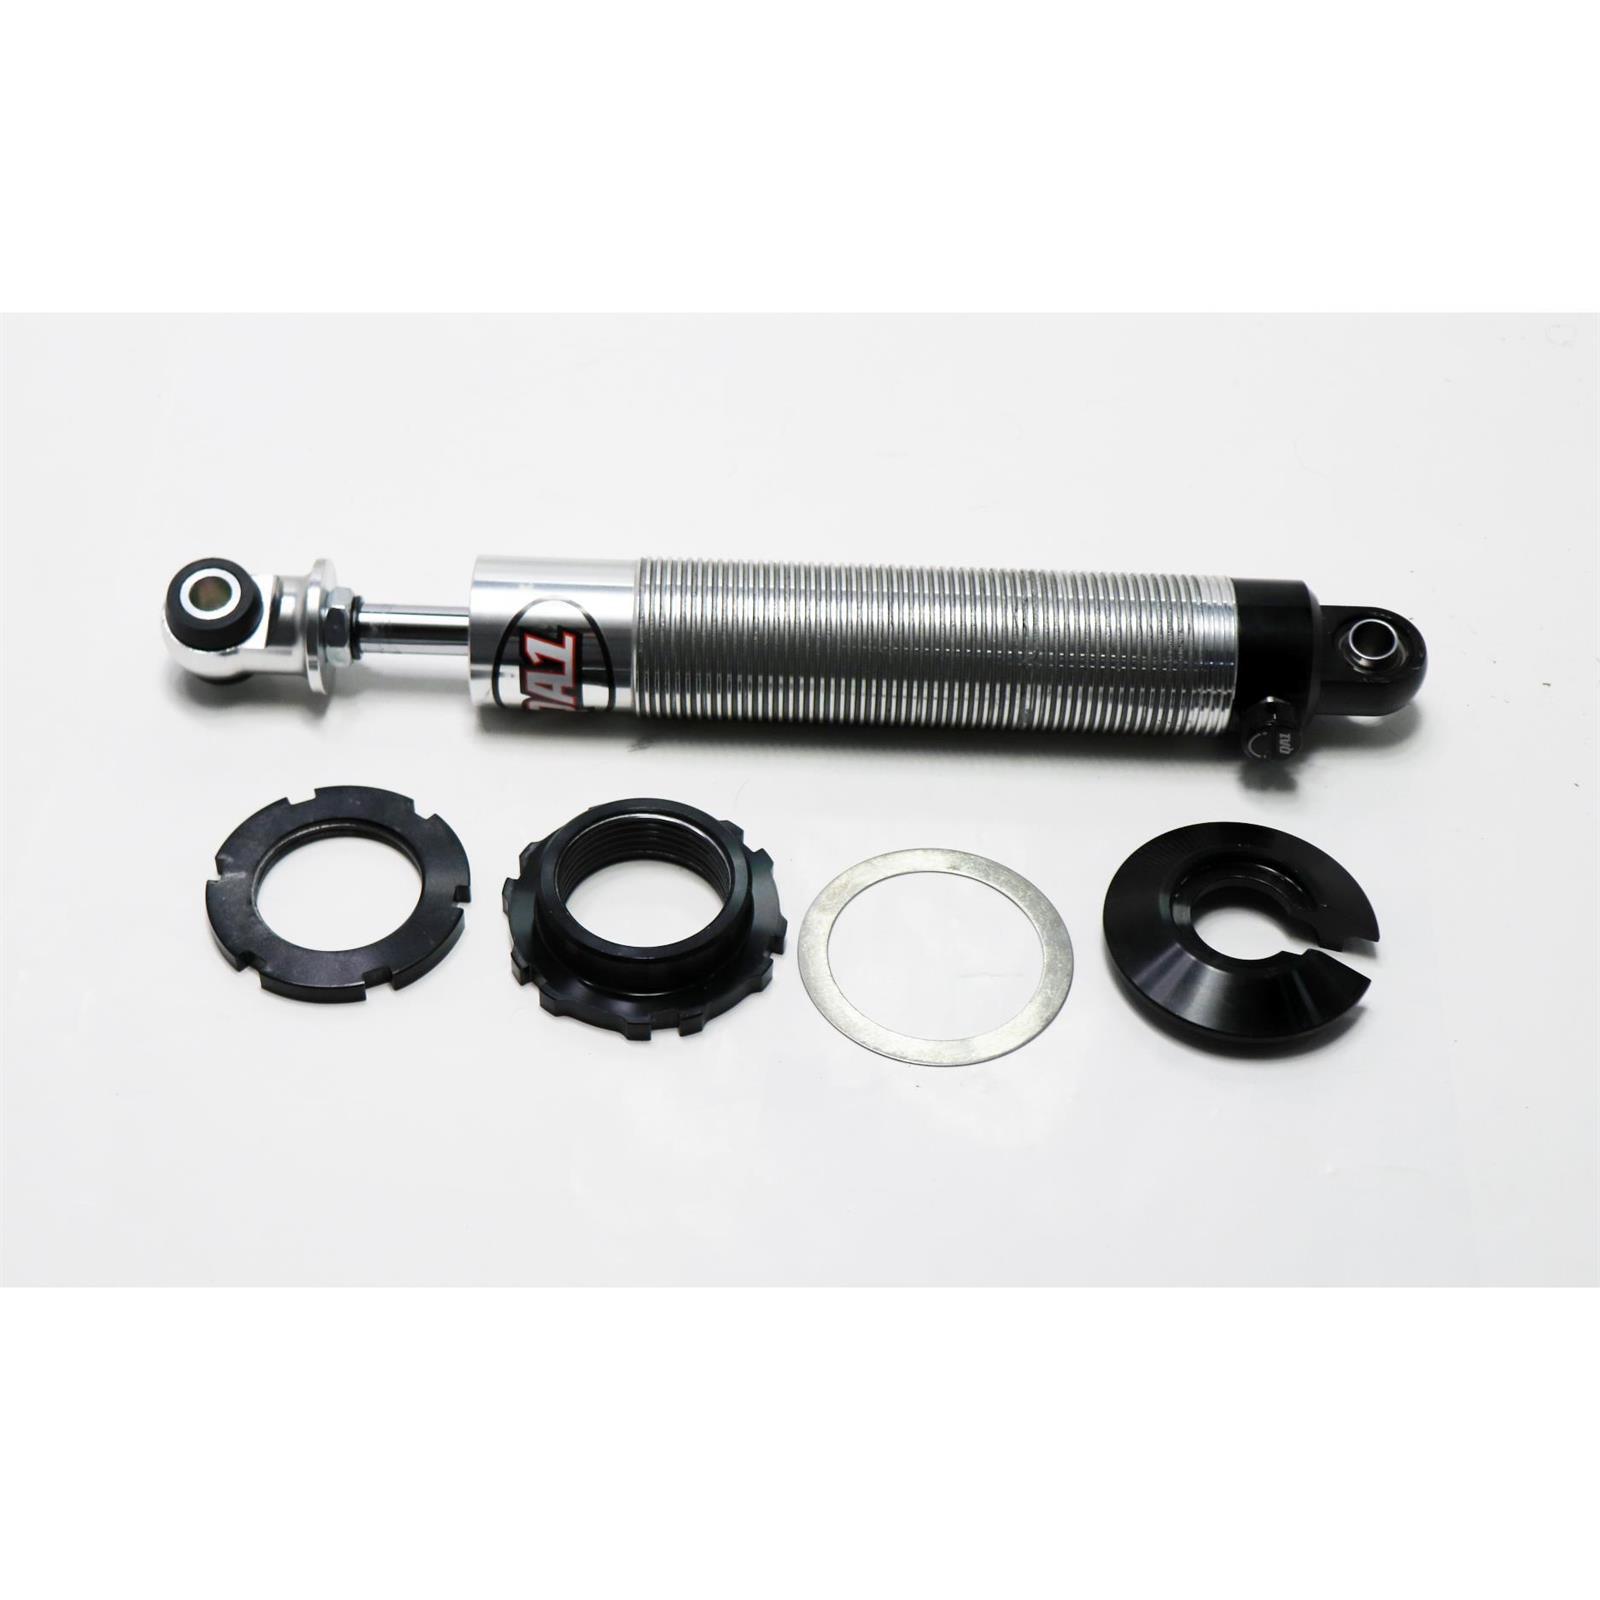 XPA Section 13mm Width Gates XPA1800 Metric-Power V-Belt 1800mm ...